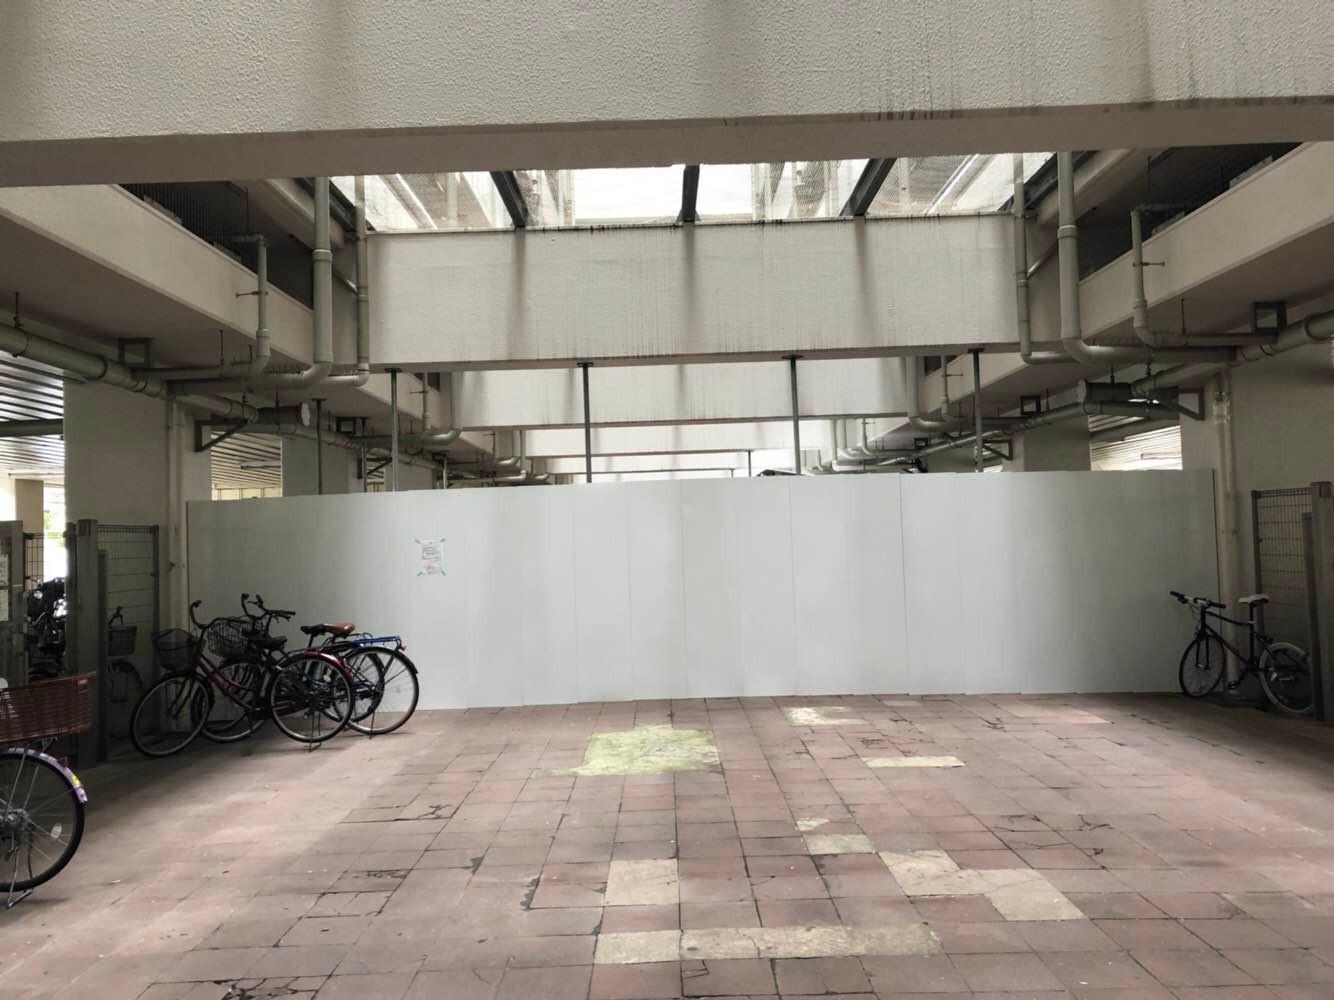 某集合住宅仮囲い:江東区 -after